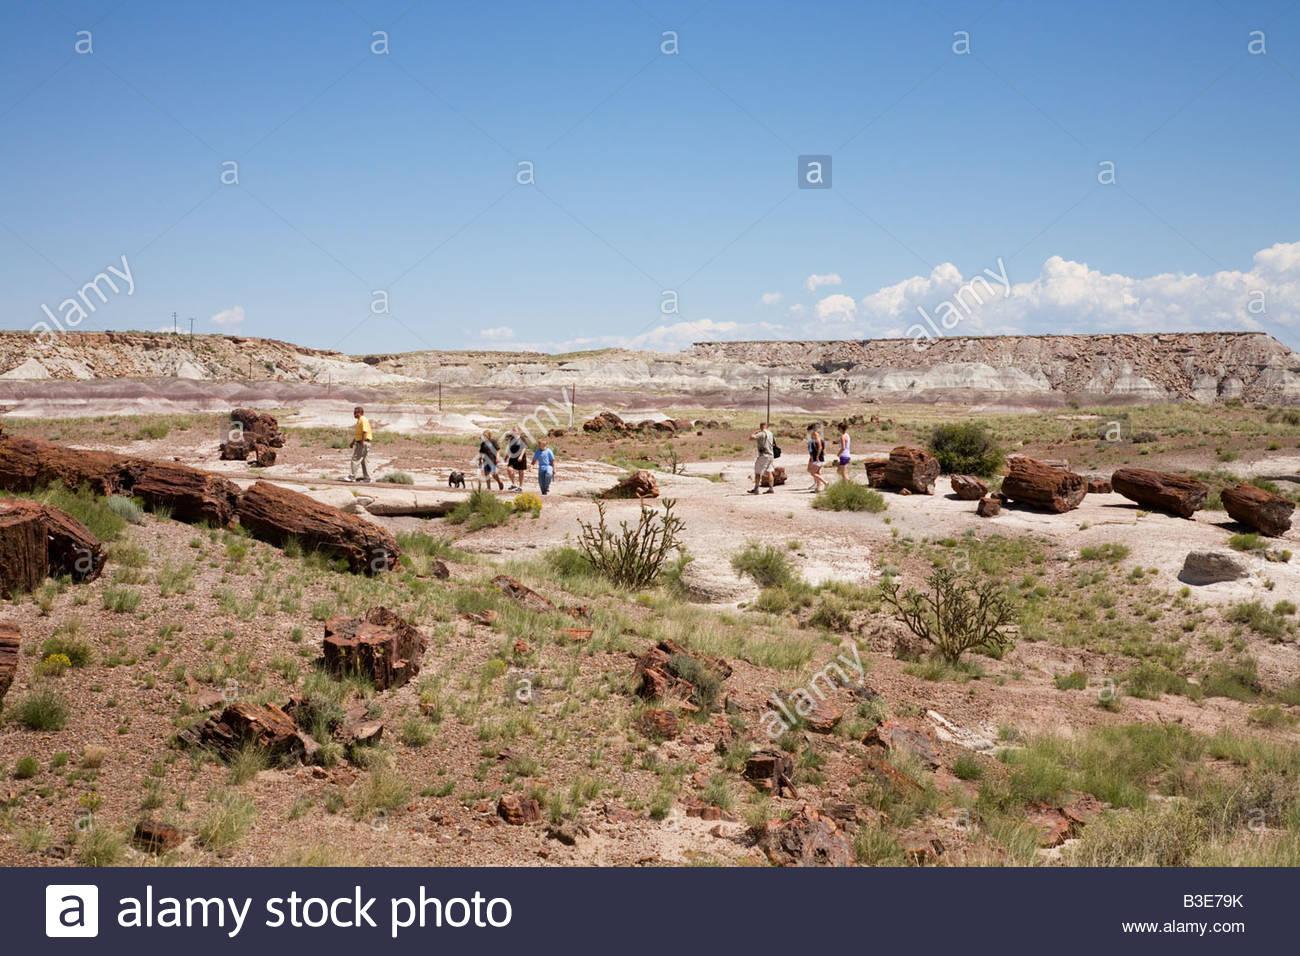 Visitors walking on Gaint Logs Trail Petrified Forest National Park Arizona - Stock Image